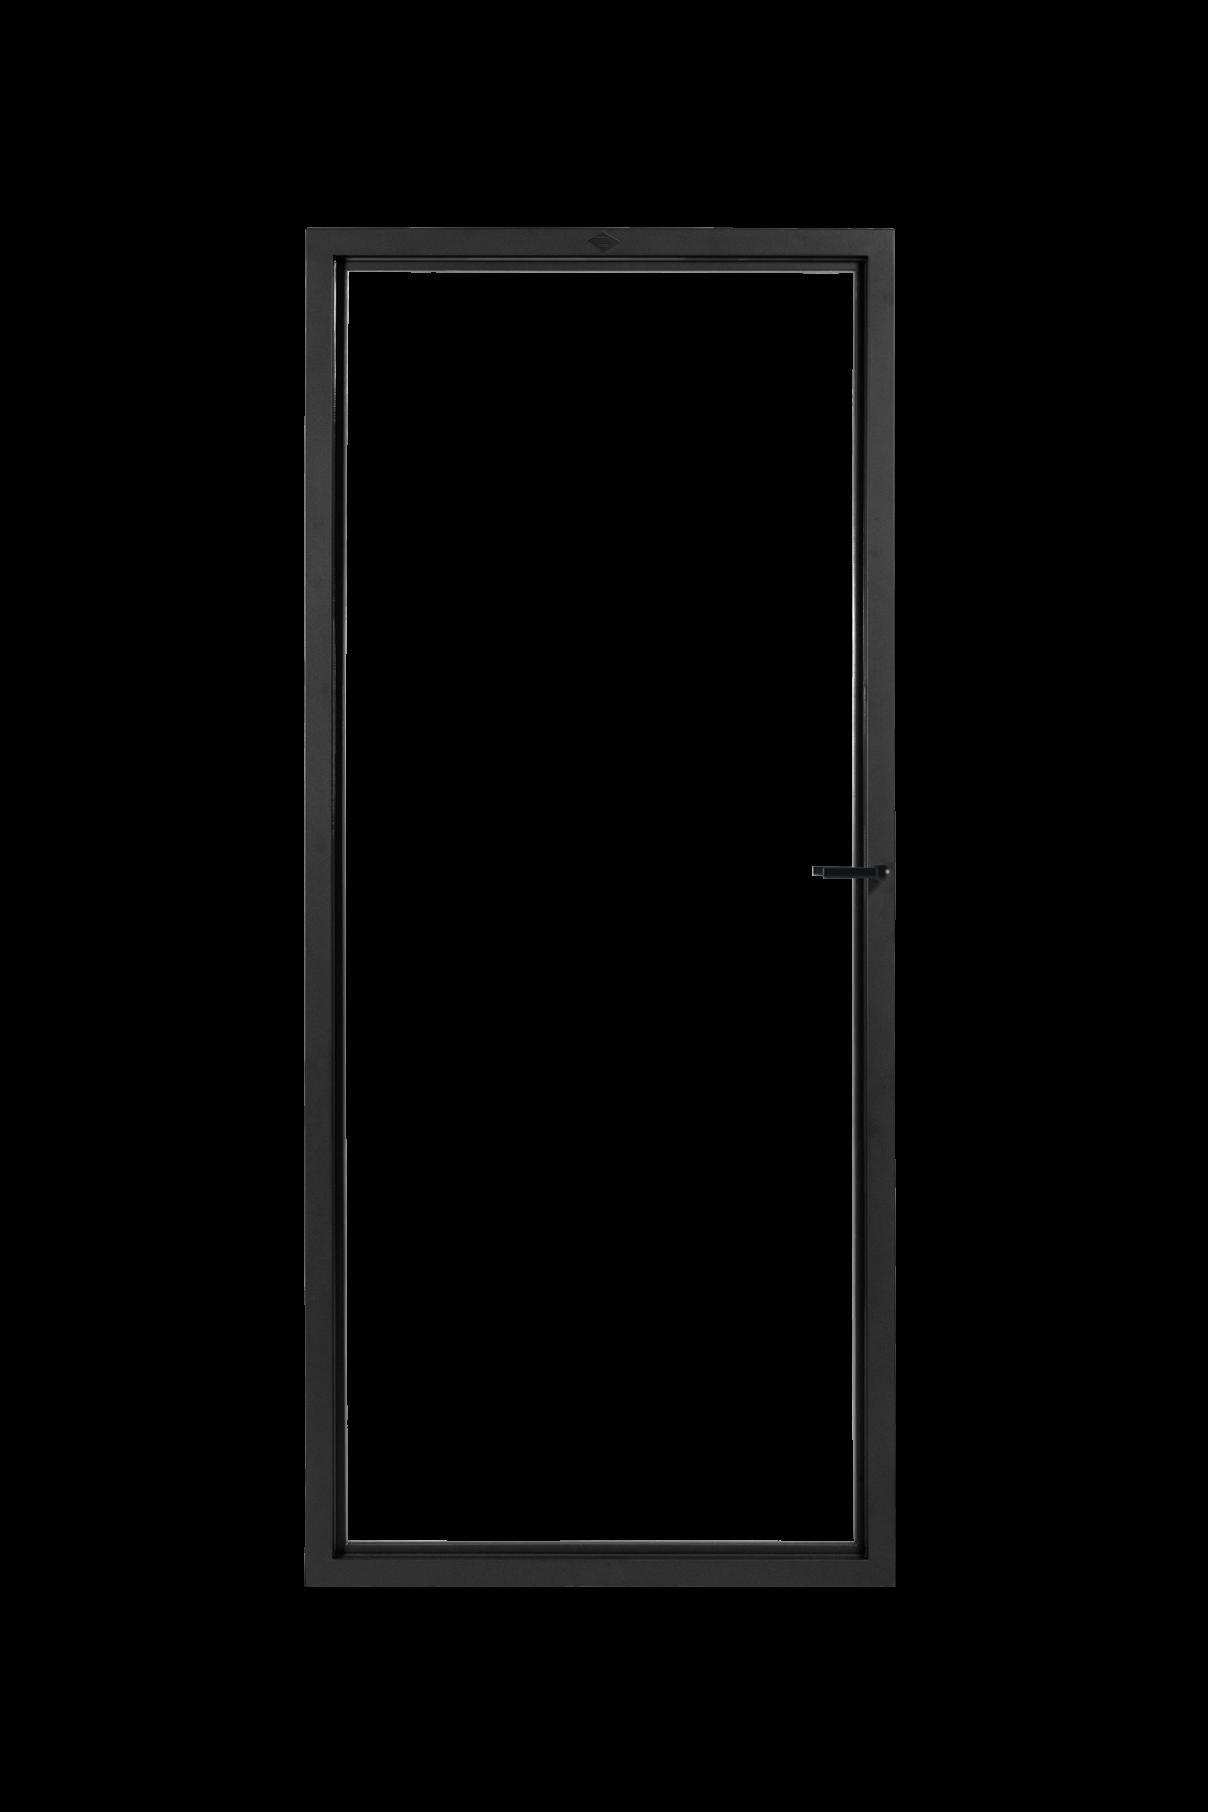 steelit-invisible-modernuni-enkel.png